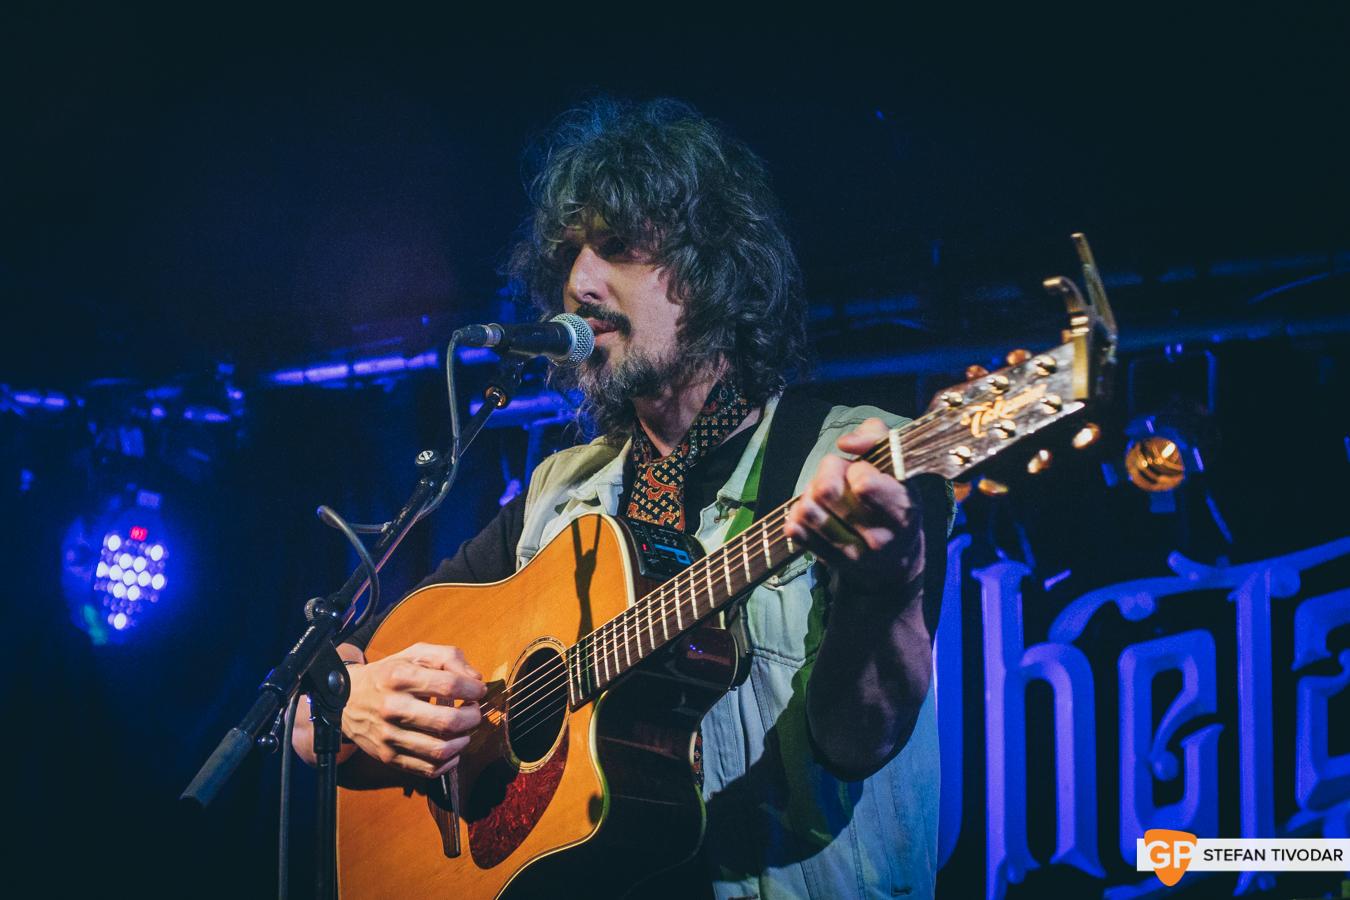 Brian Gallagher A night for Joe Whelans July 2019 Tivodar